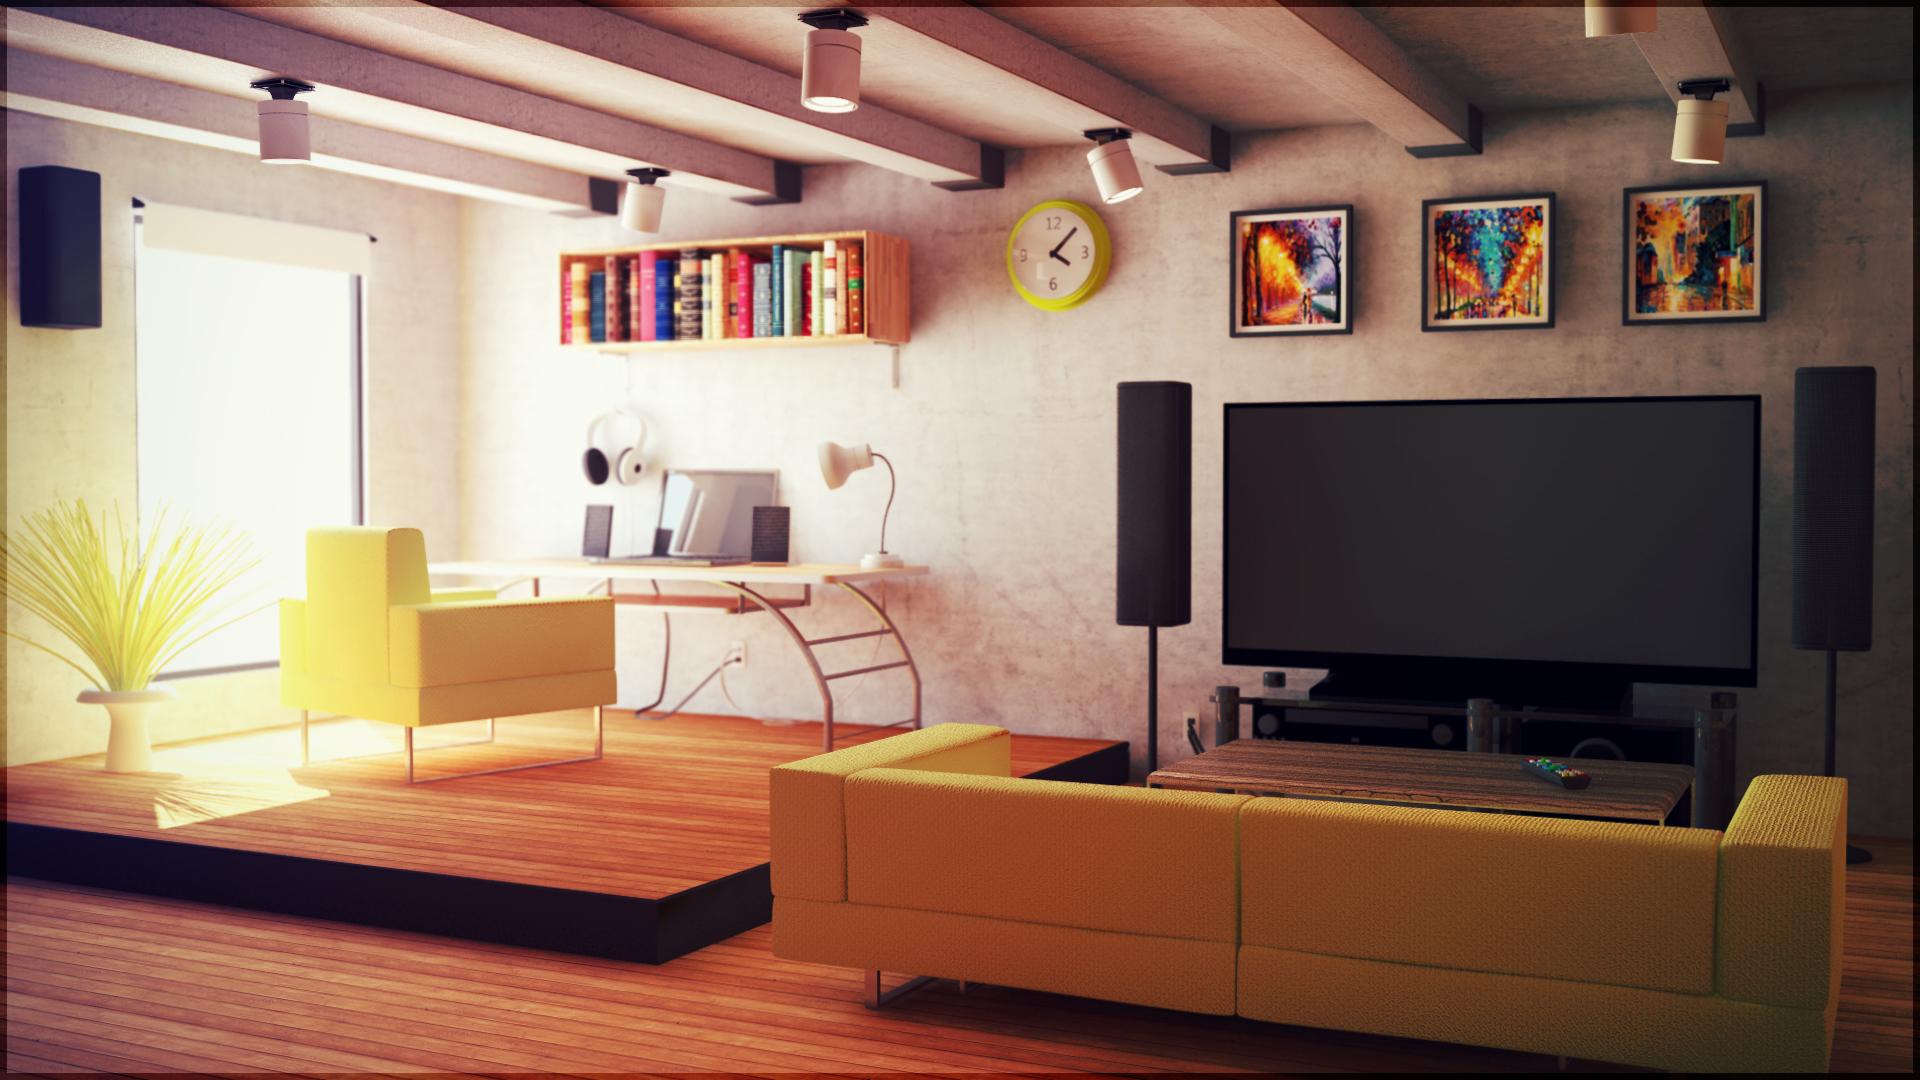 Studio Apartment By Jesse On Deviantart